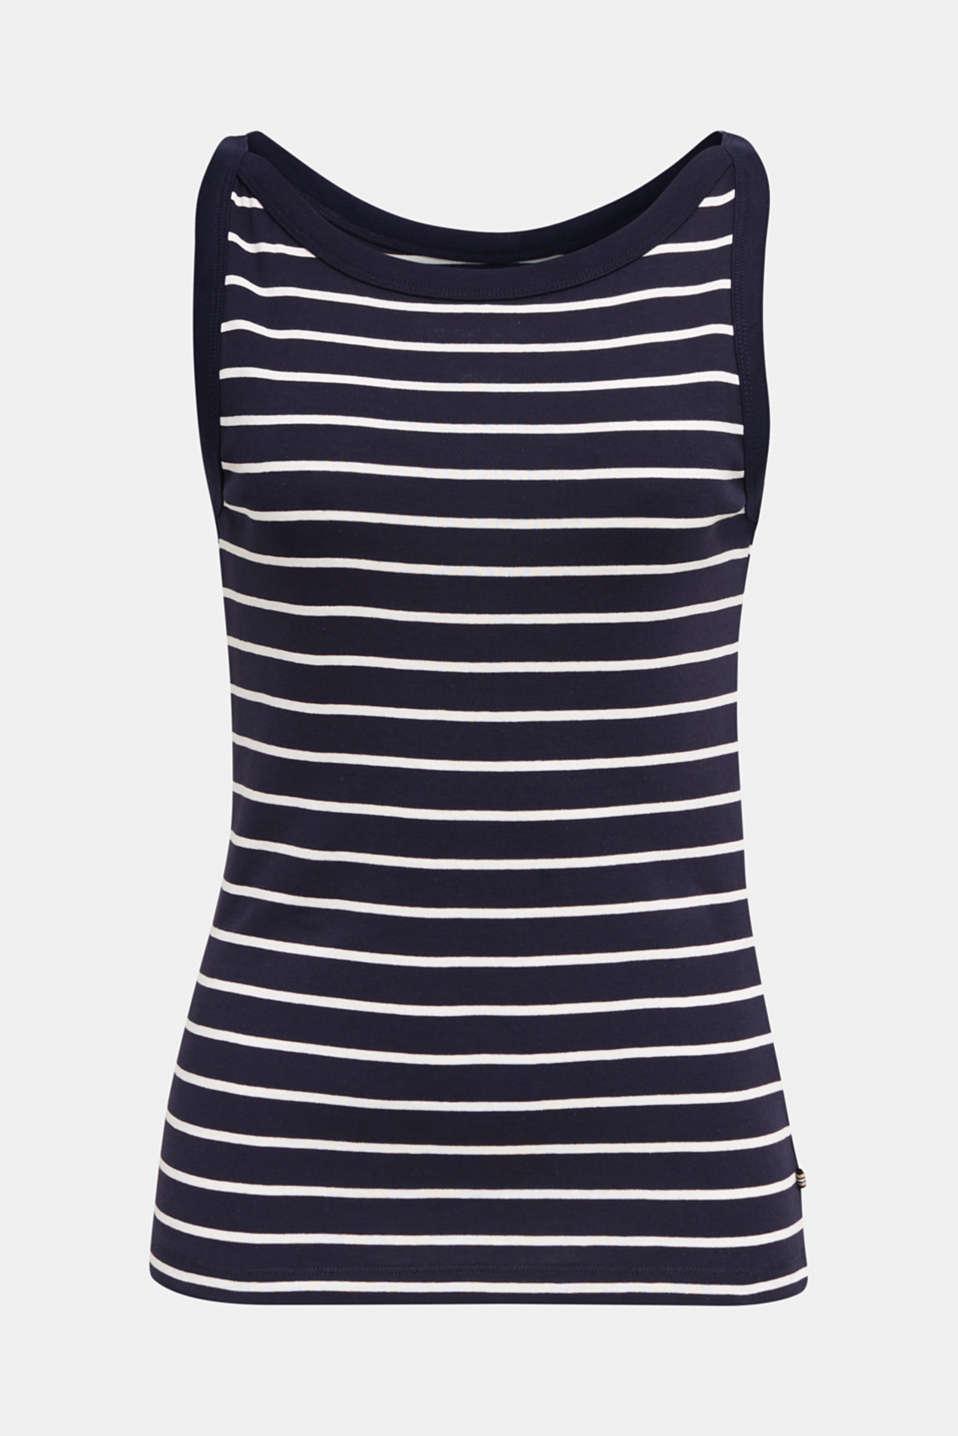 Striped T-shirt, organic cotton, NAVY, detail image number 5